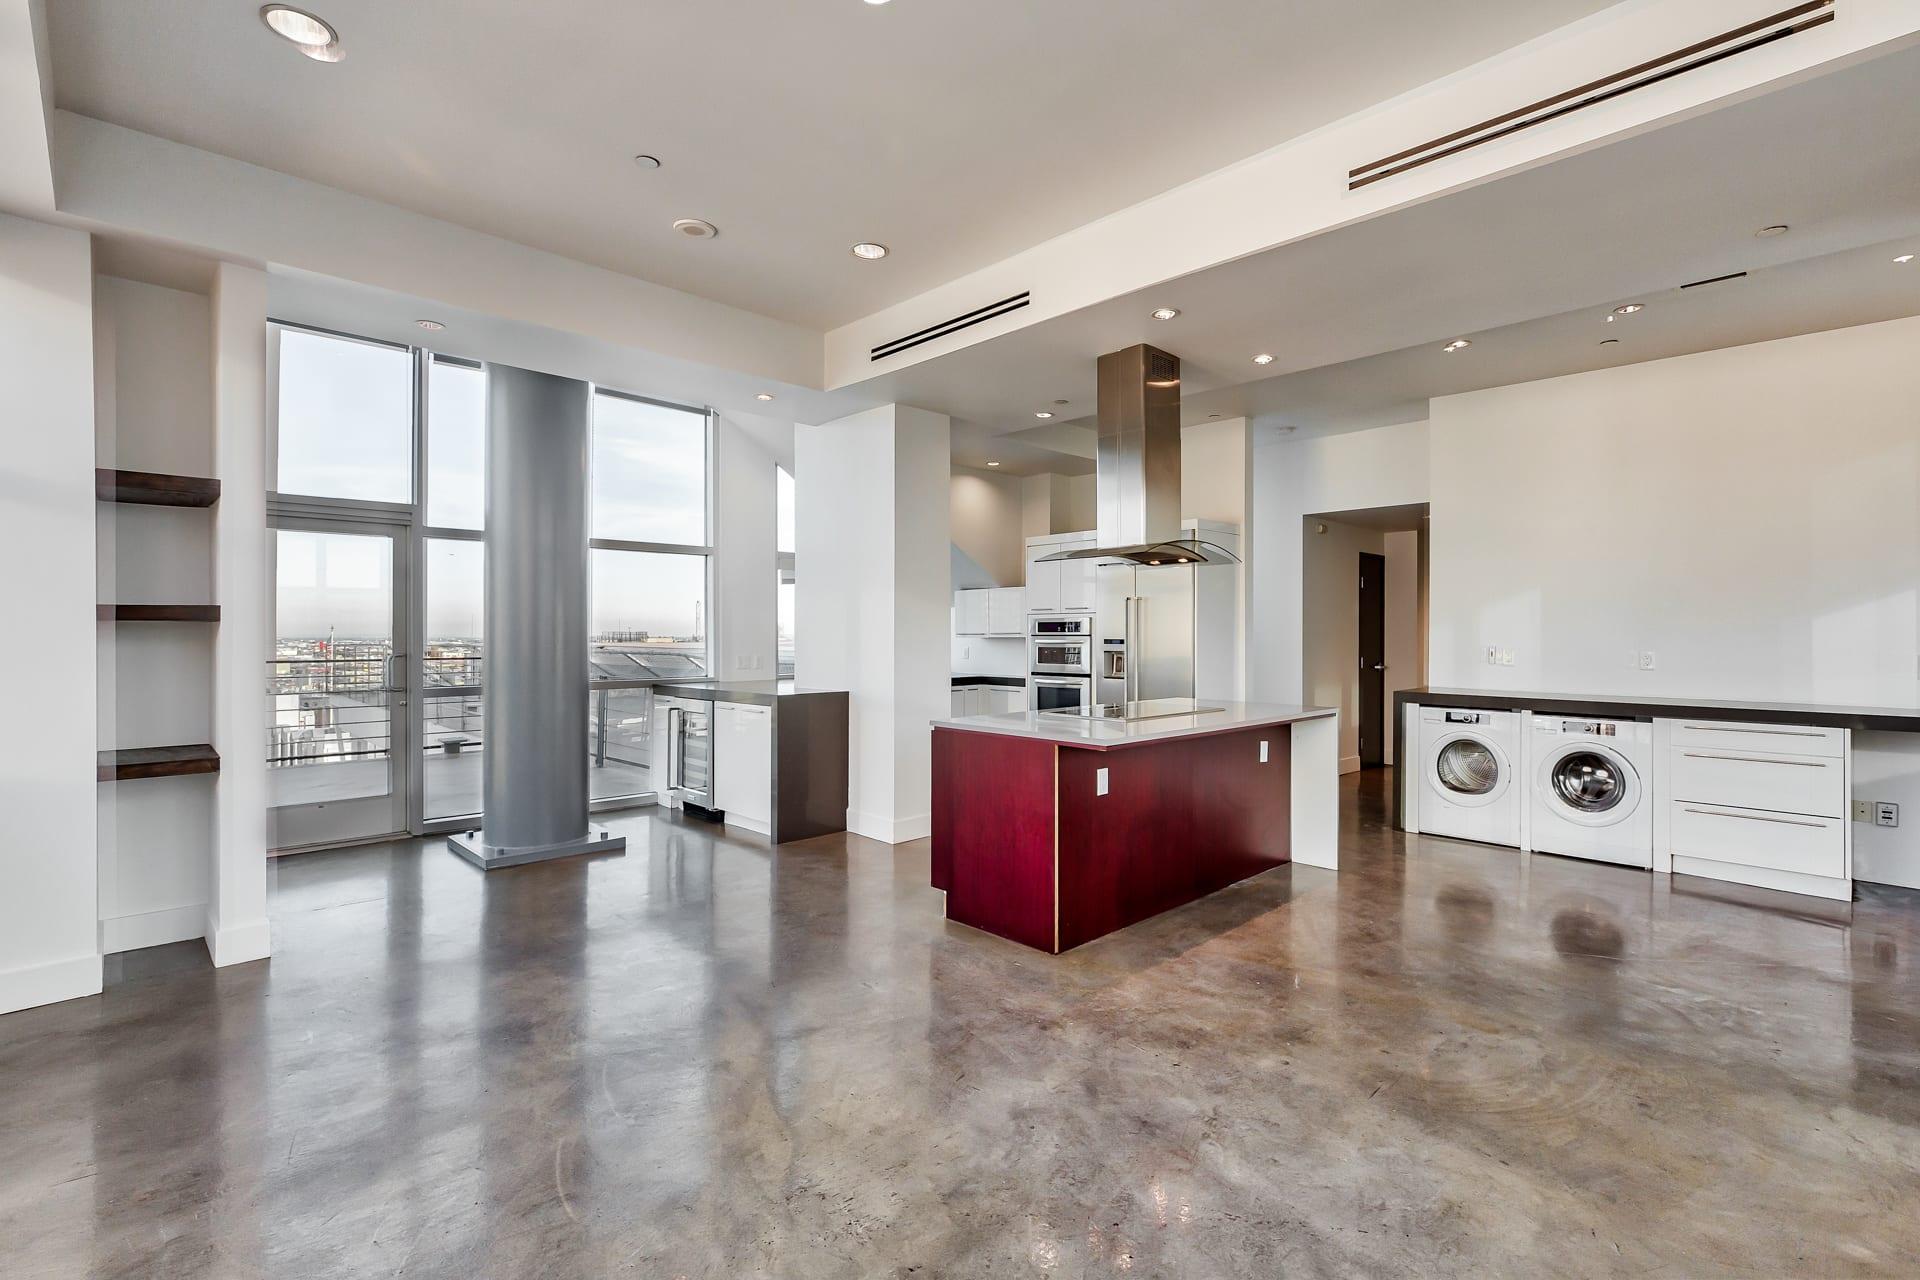 Floor Plan  Spacious, open layout apartment at Renaissance Tower, California, 90015, opens a dialog